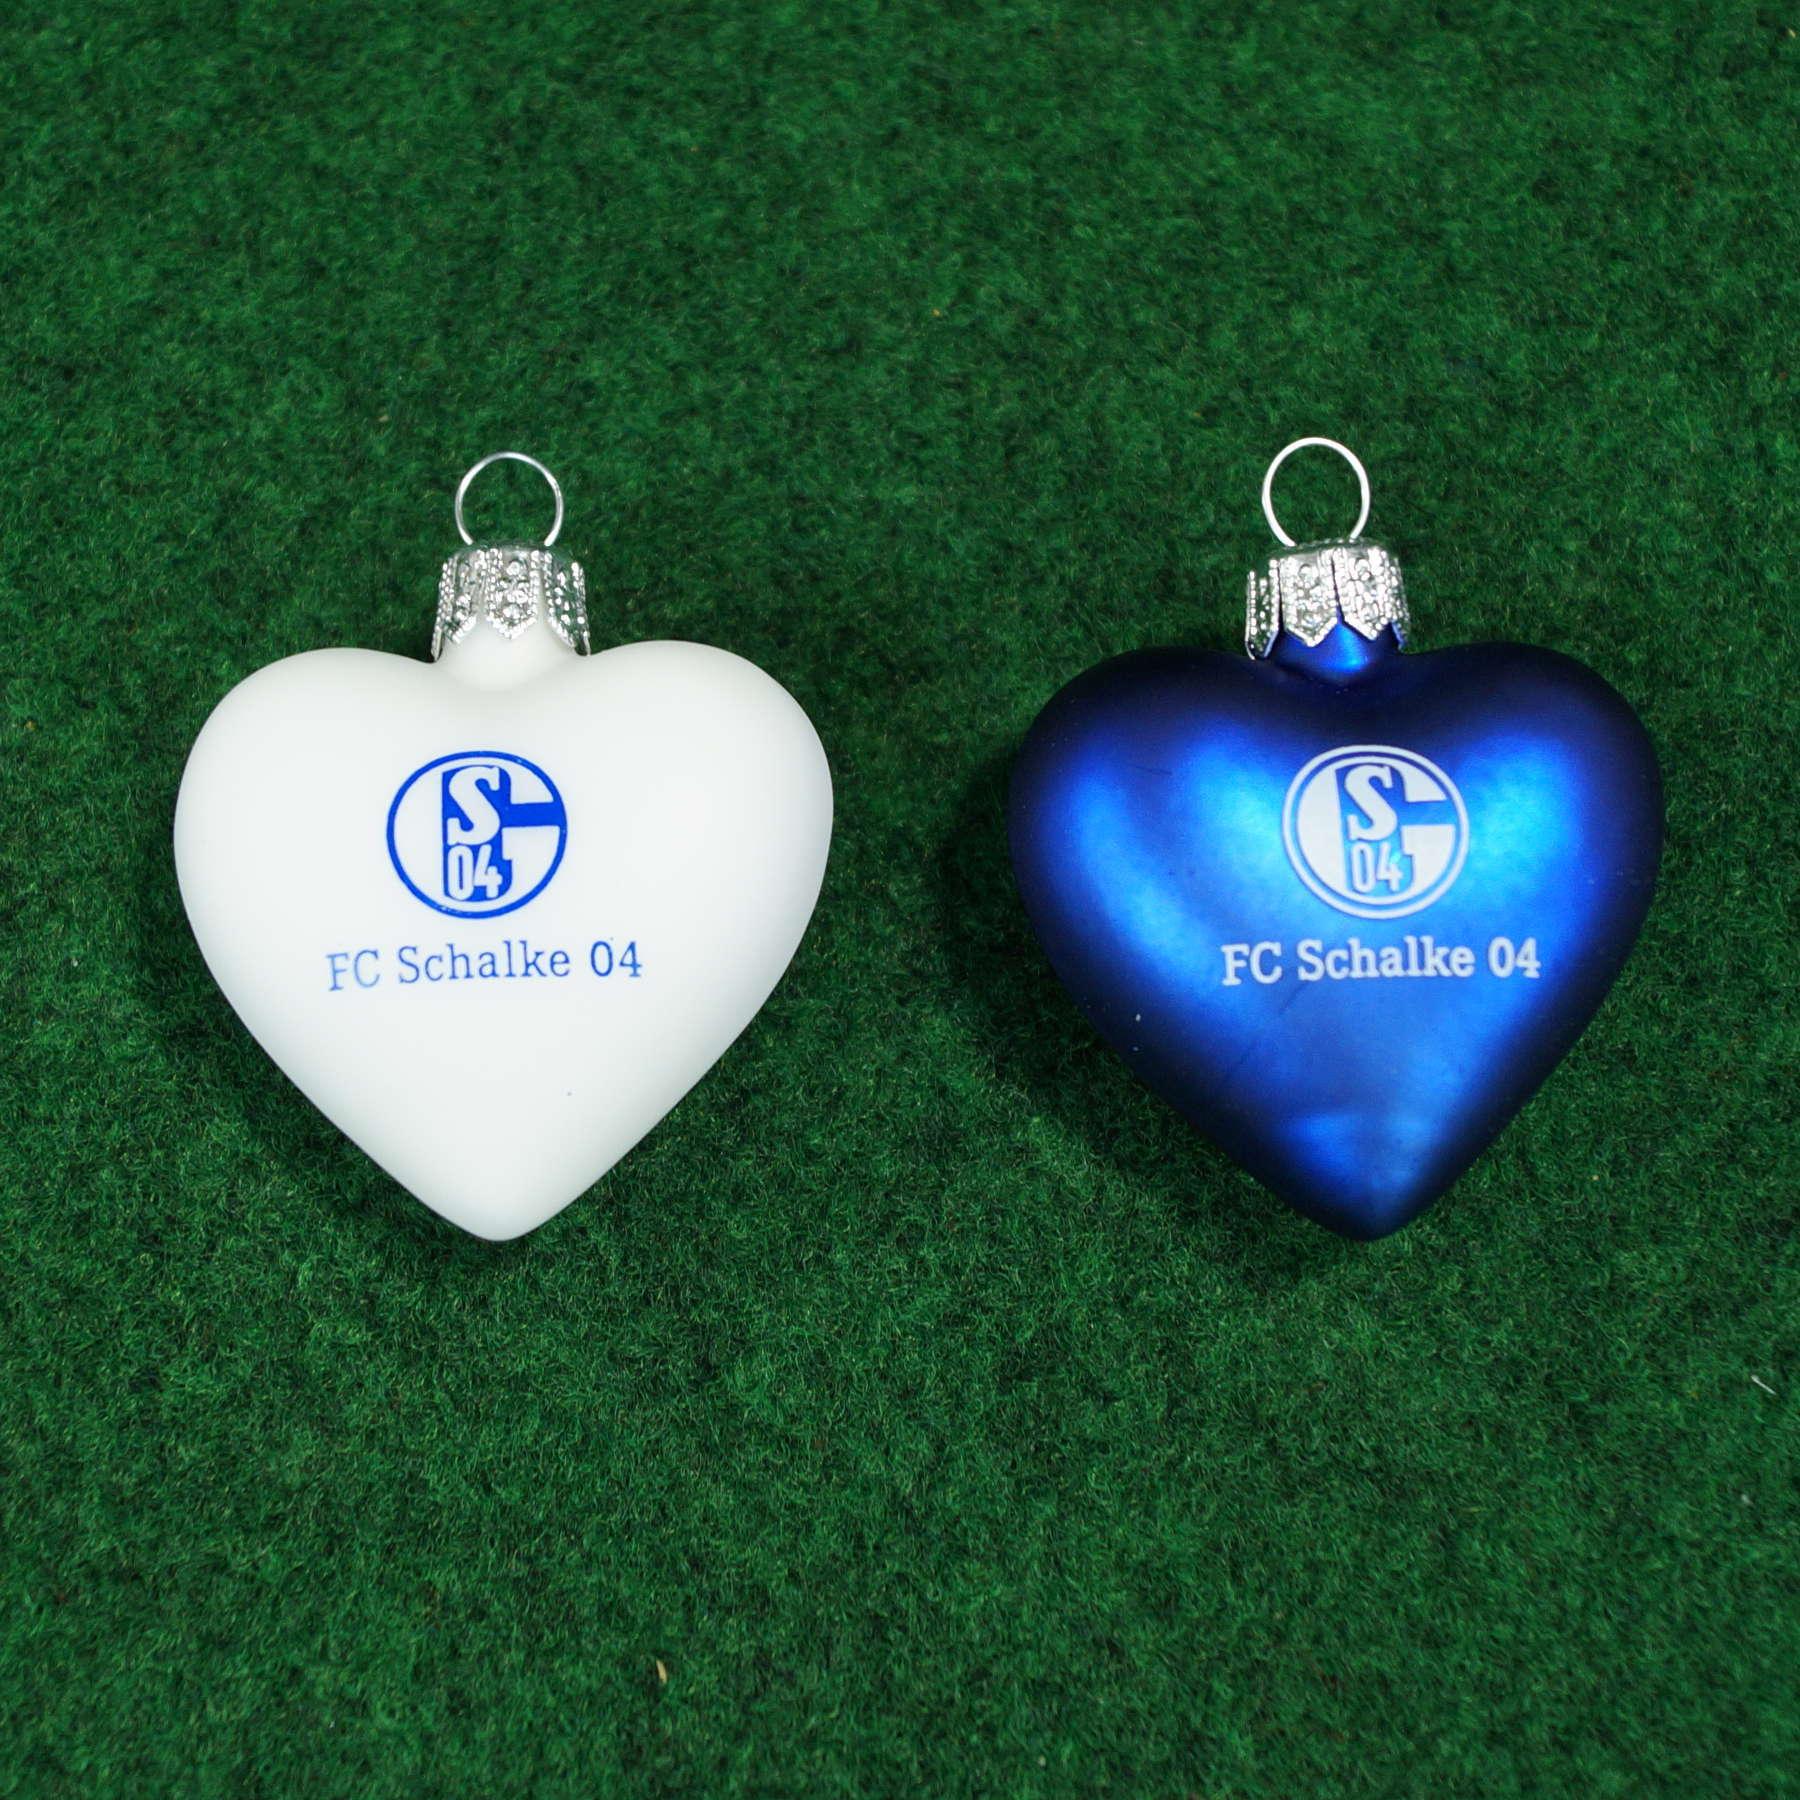 FC Schalke 04 Glasherzen 2er-Set, Christbaumschmuck